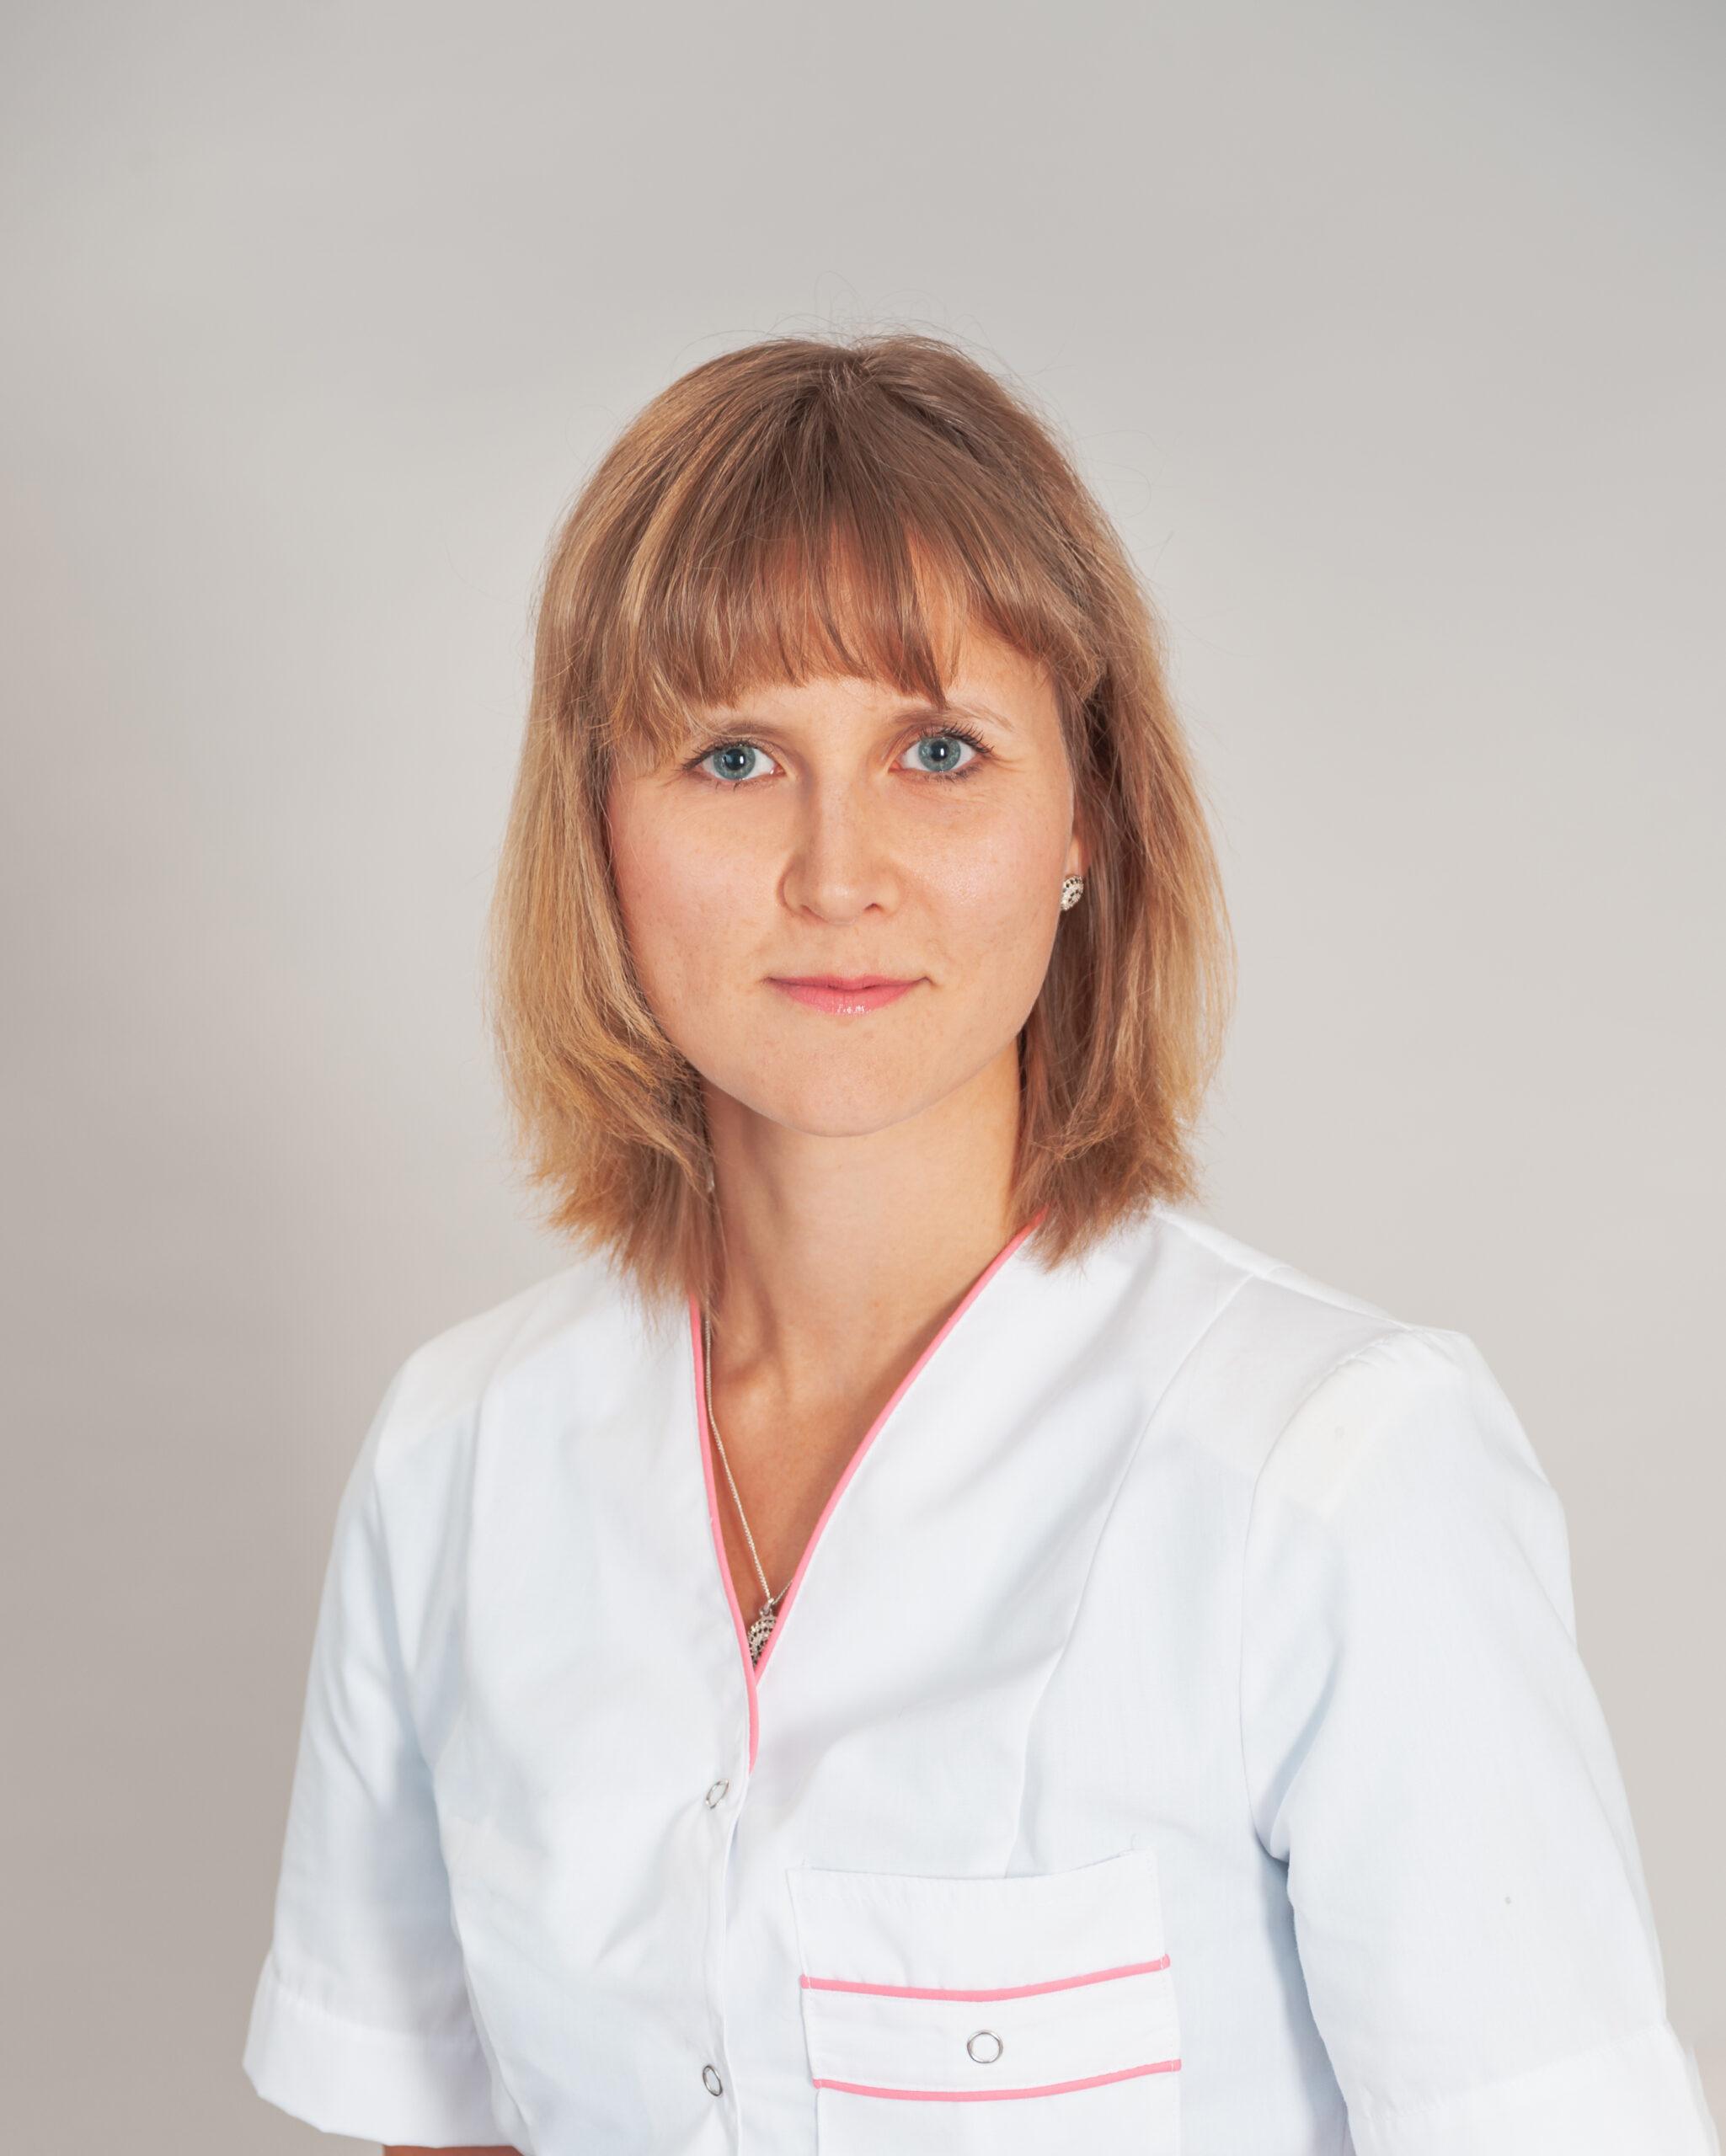 Алёна Плетнёва